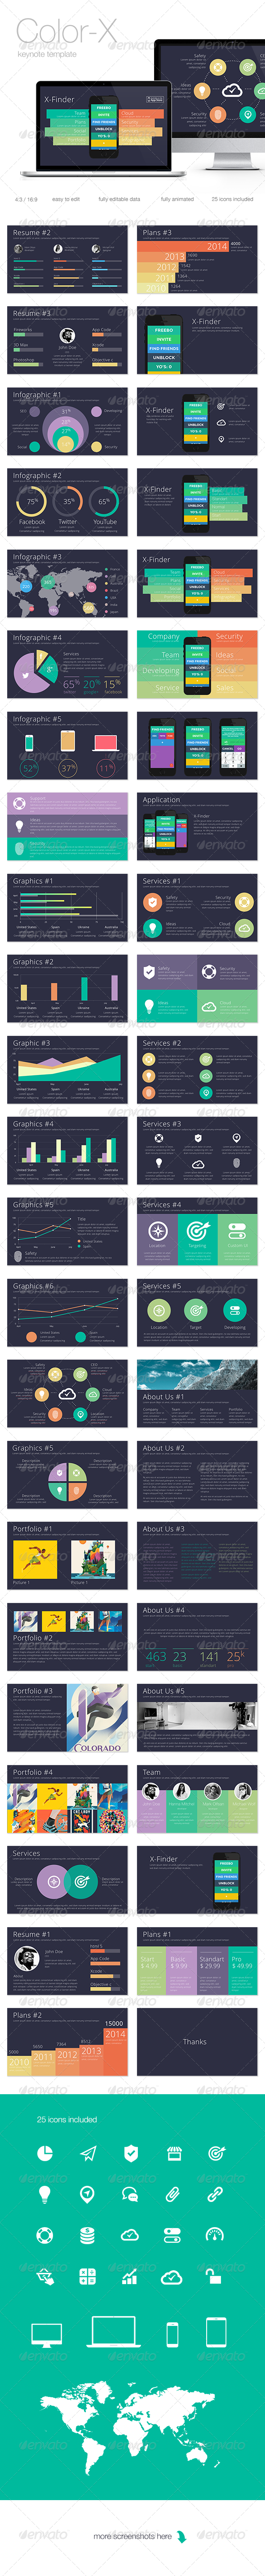 App Presentation Graphics, Designs & Templates from GraphicRiver